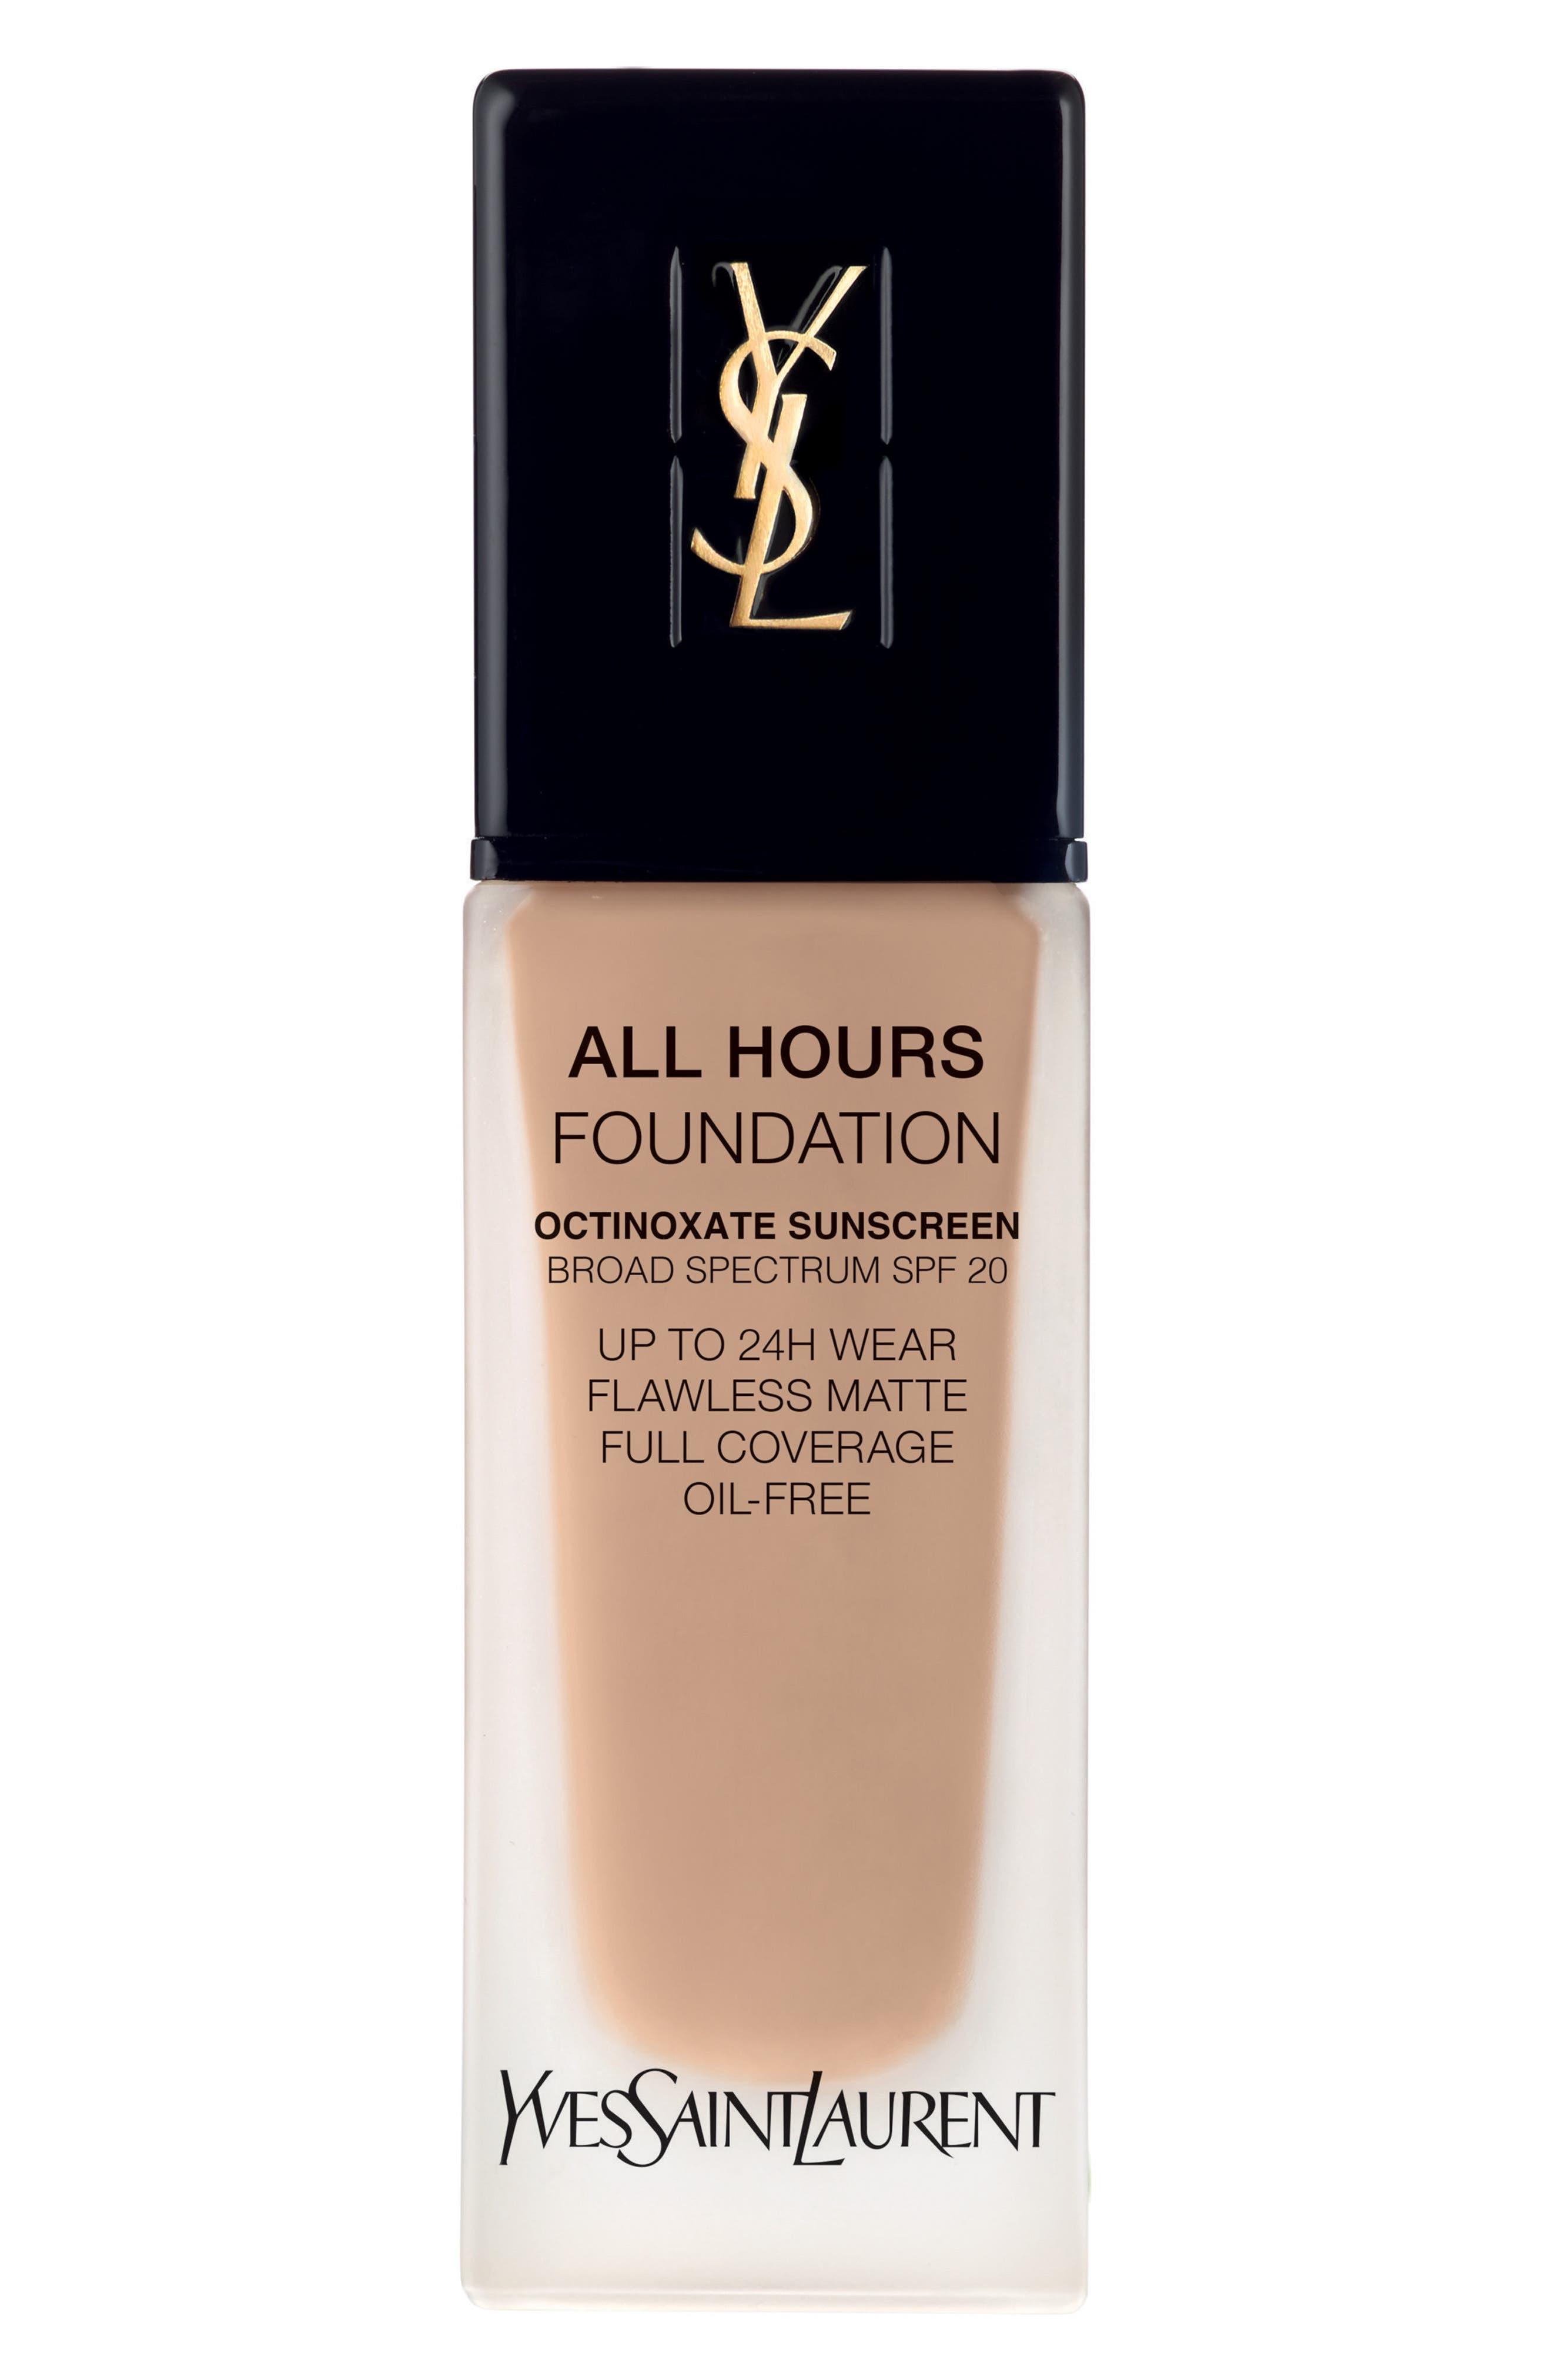 Yves Saint Laurent All Hours Full Coverage Matte Foundation Spf 20 - Br40 Cool Sand